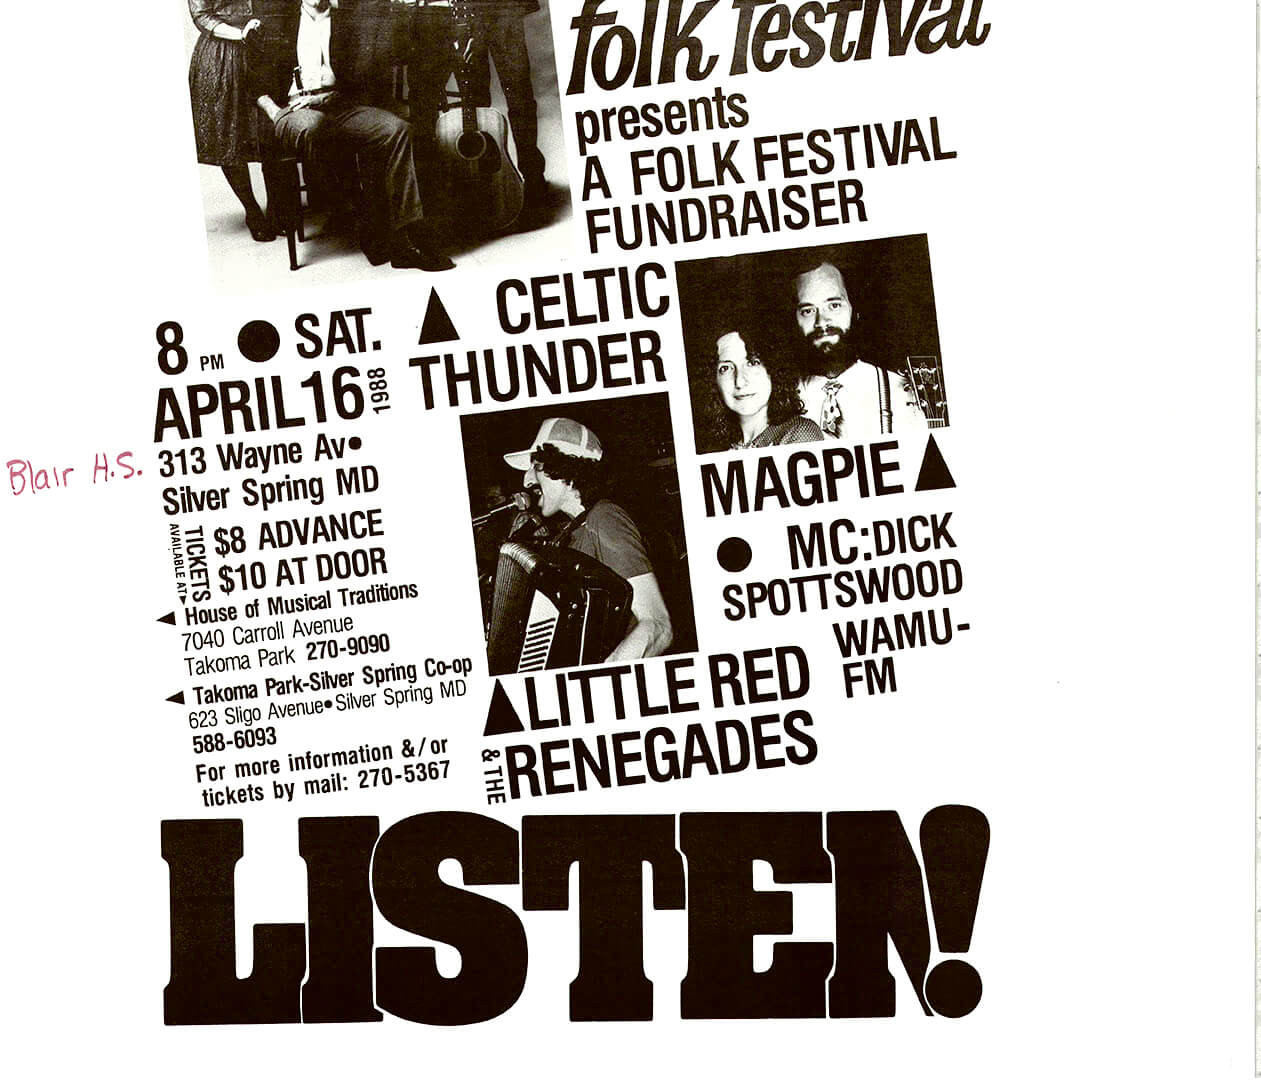 TPFF.1988.poster.web.jpg